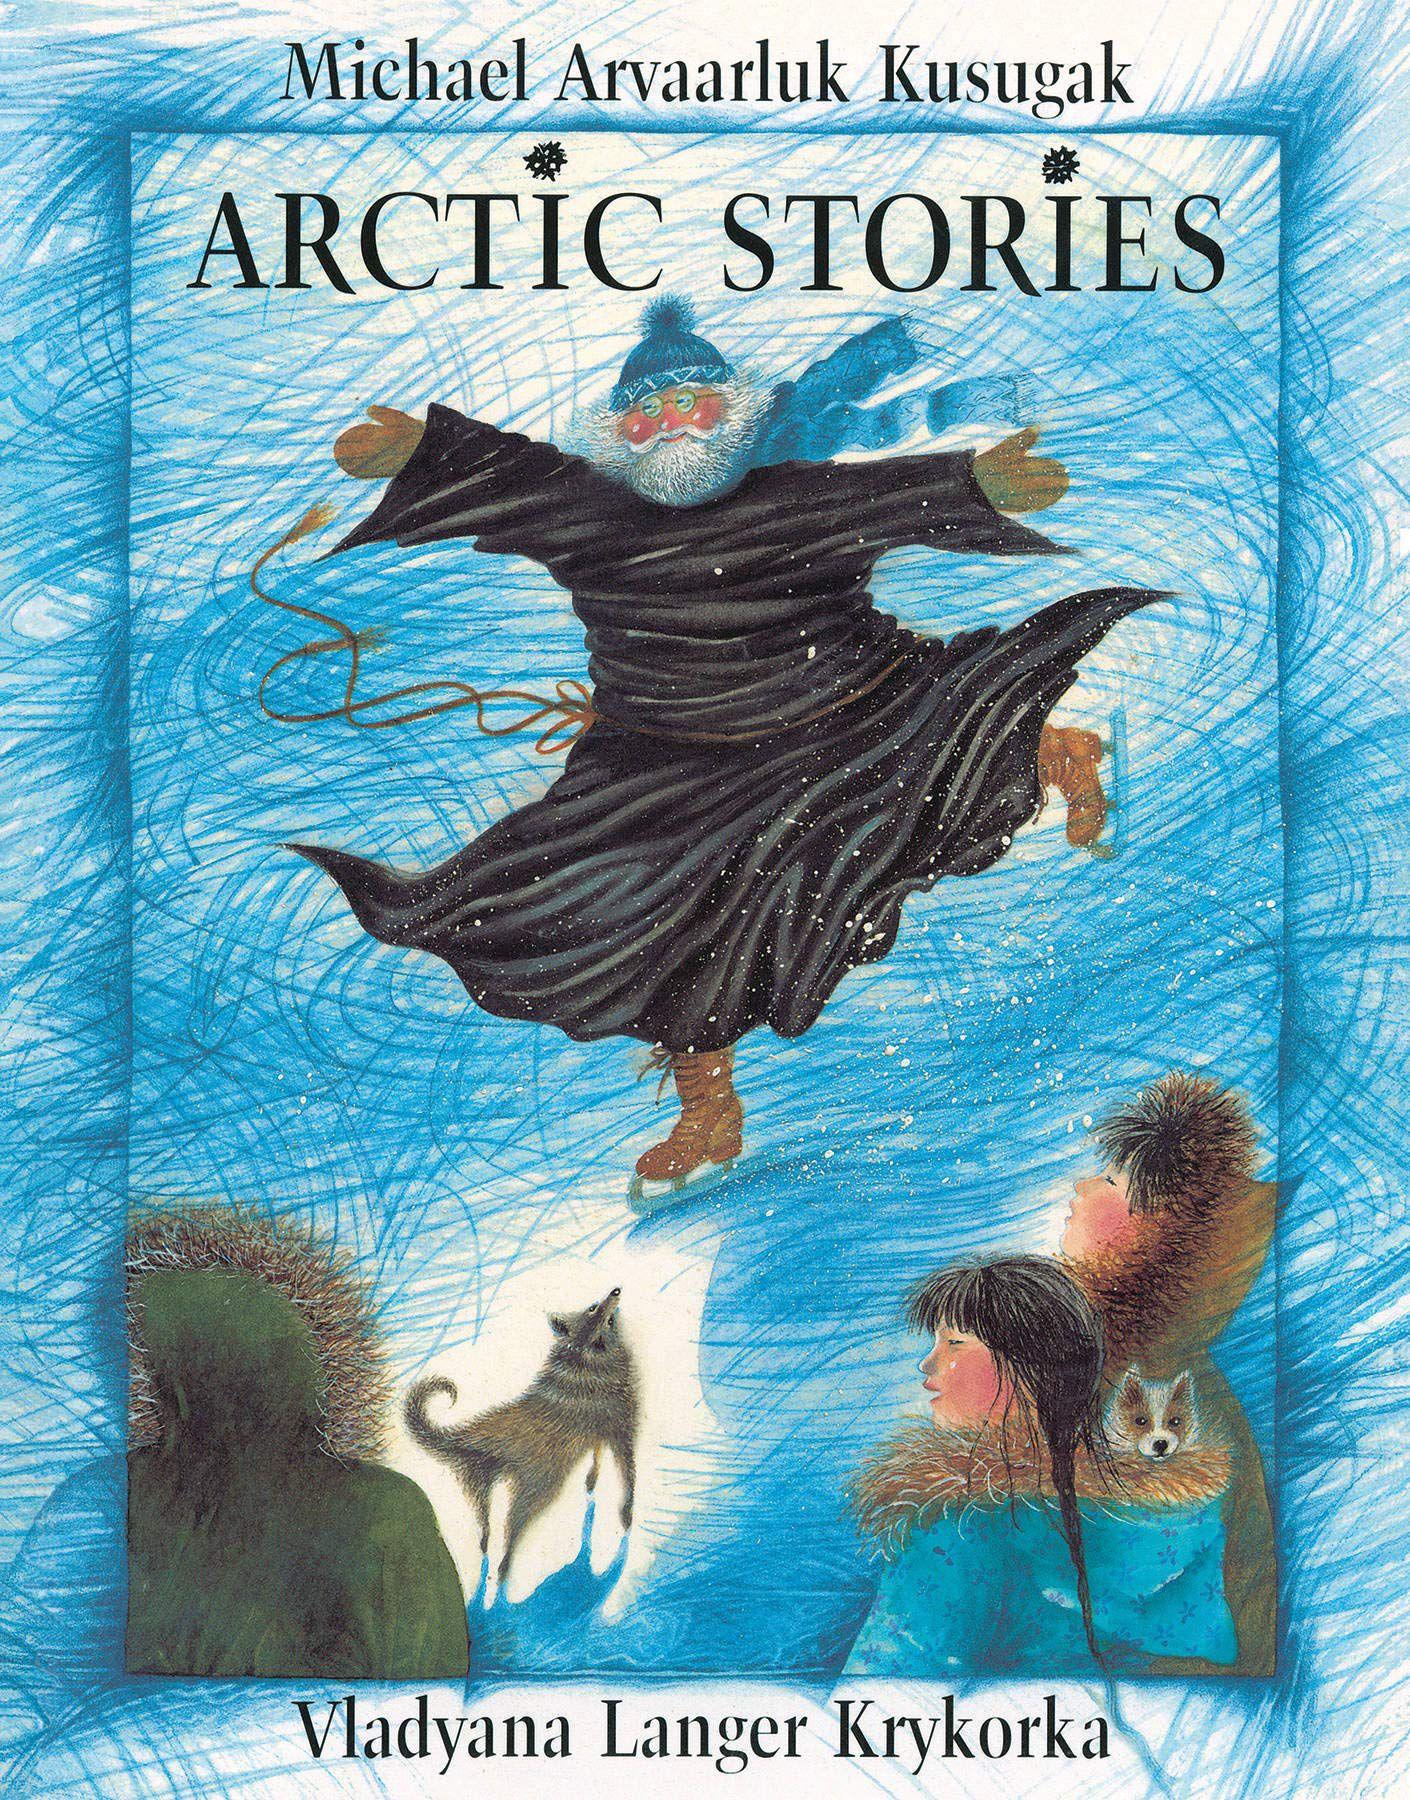 Arctic Stories by Michael Kusugak